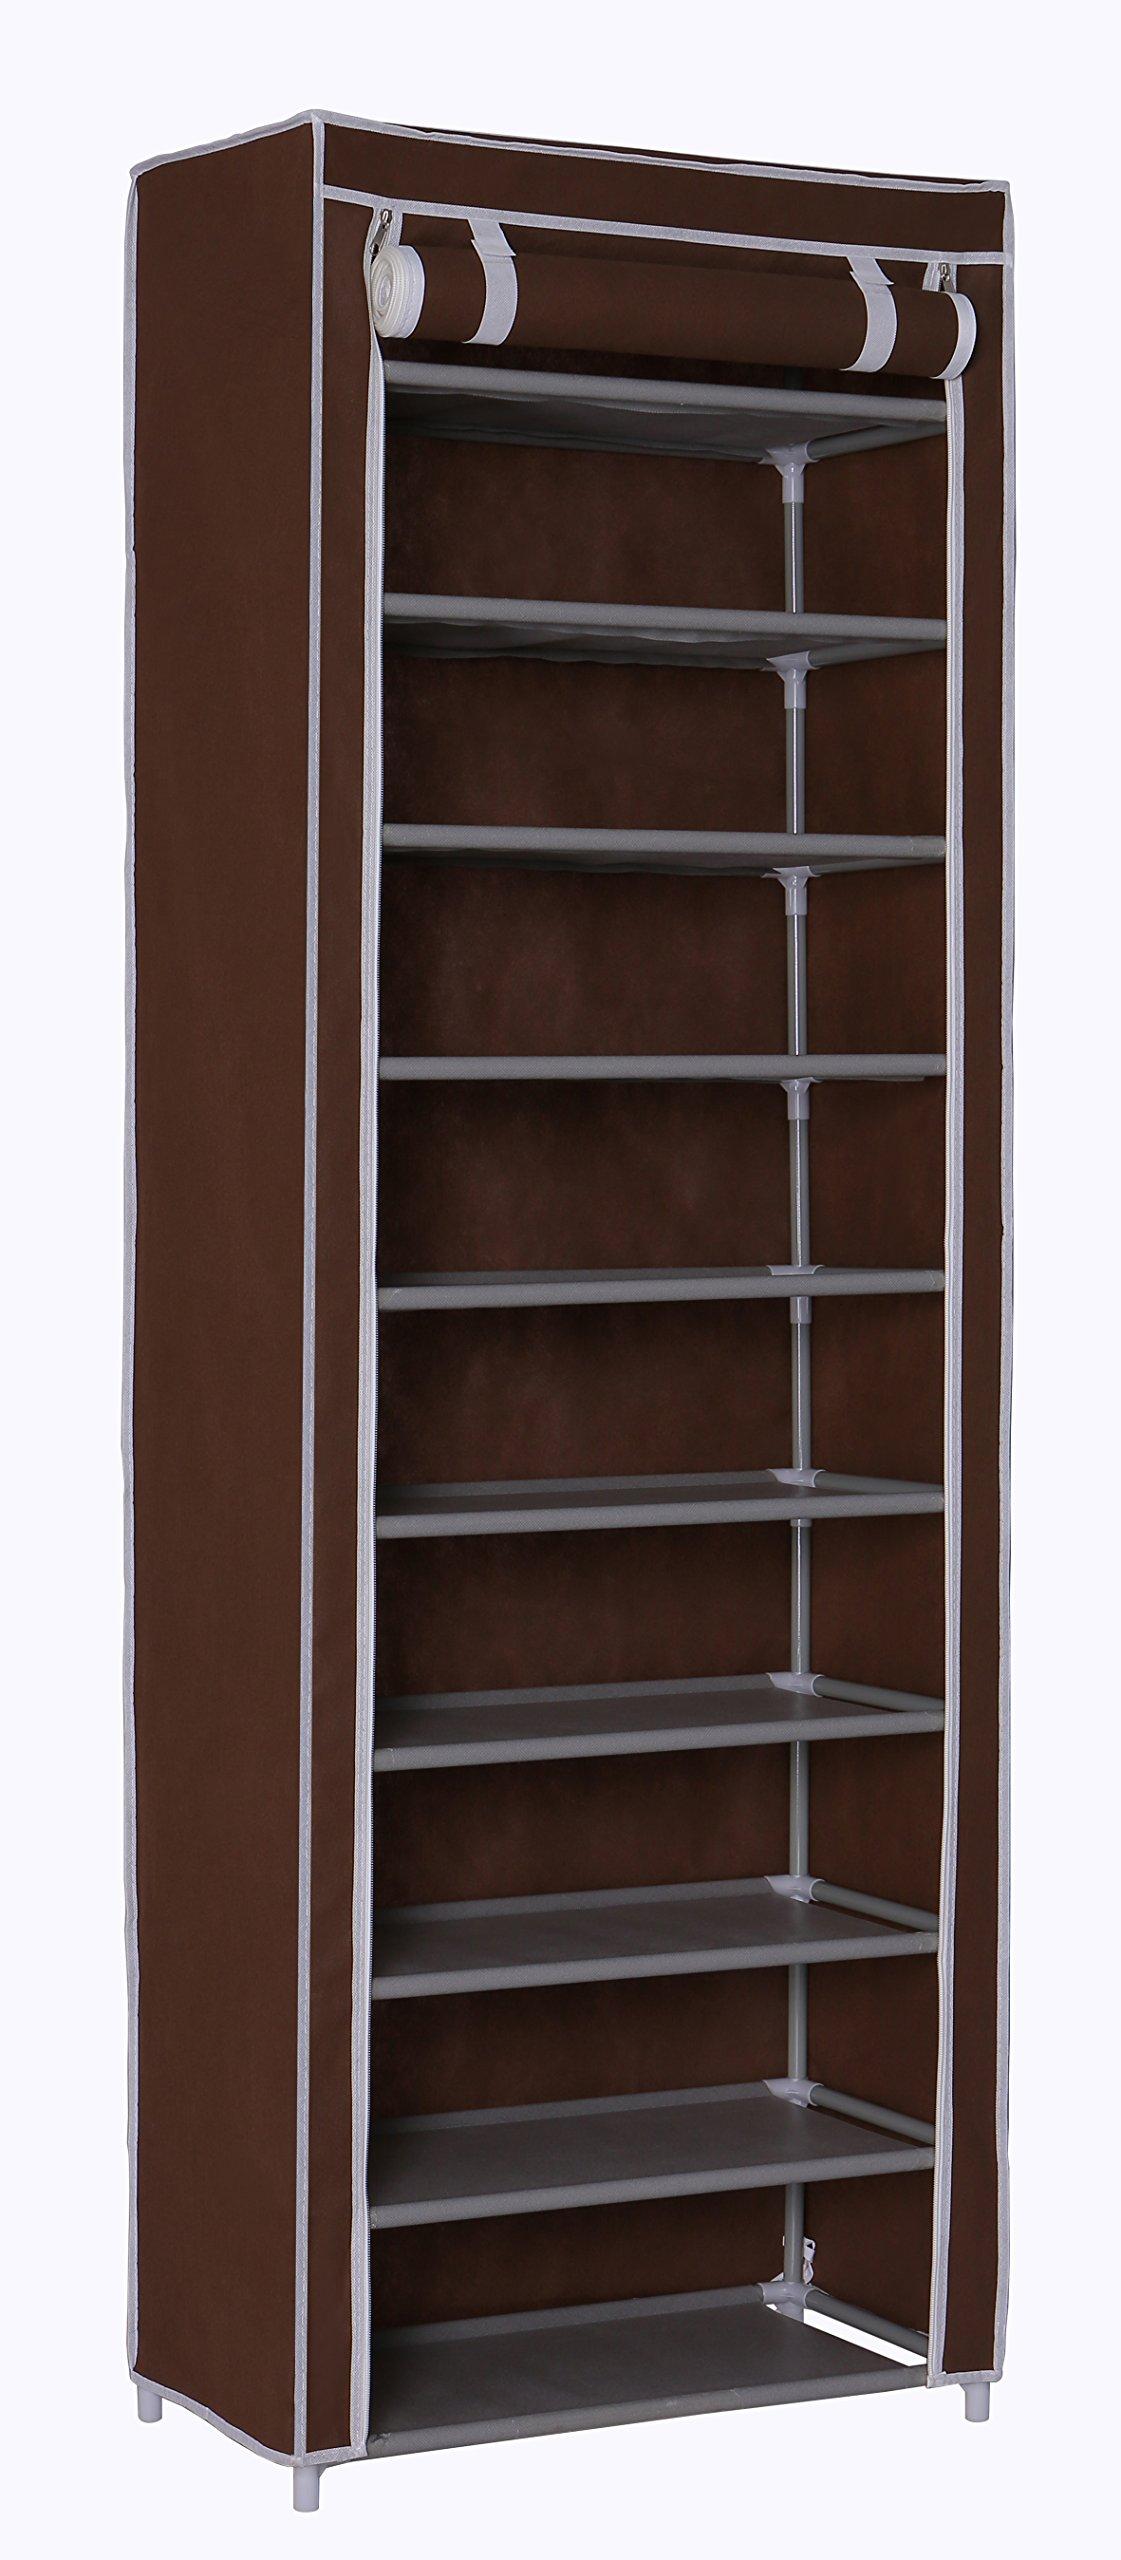 "Homebi 10-Tier Shoe Rack 30 Pairs Shoe Tower Closet Shoes Storage Cabinet Portable Boot Organizer Dustproof Non-Woven Fabric Cover 10 Durable Shelves,24.2""W x 12.4"" D x 68.3""H (Brown)"